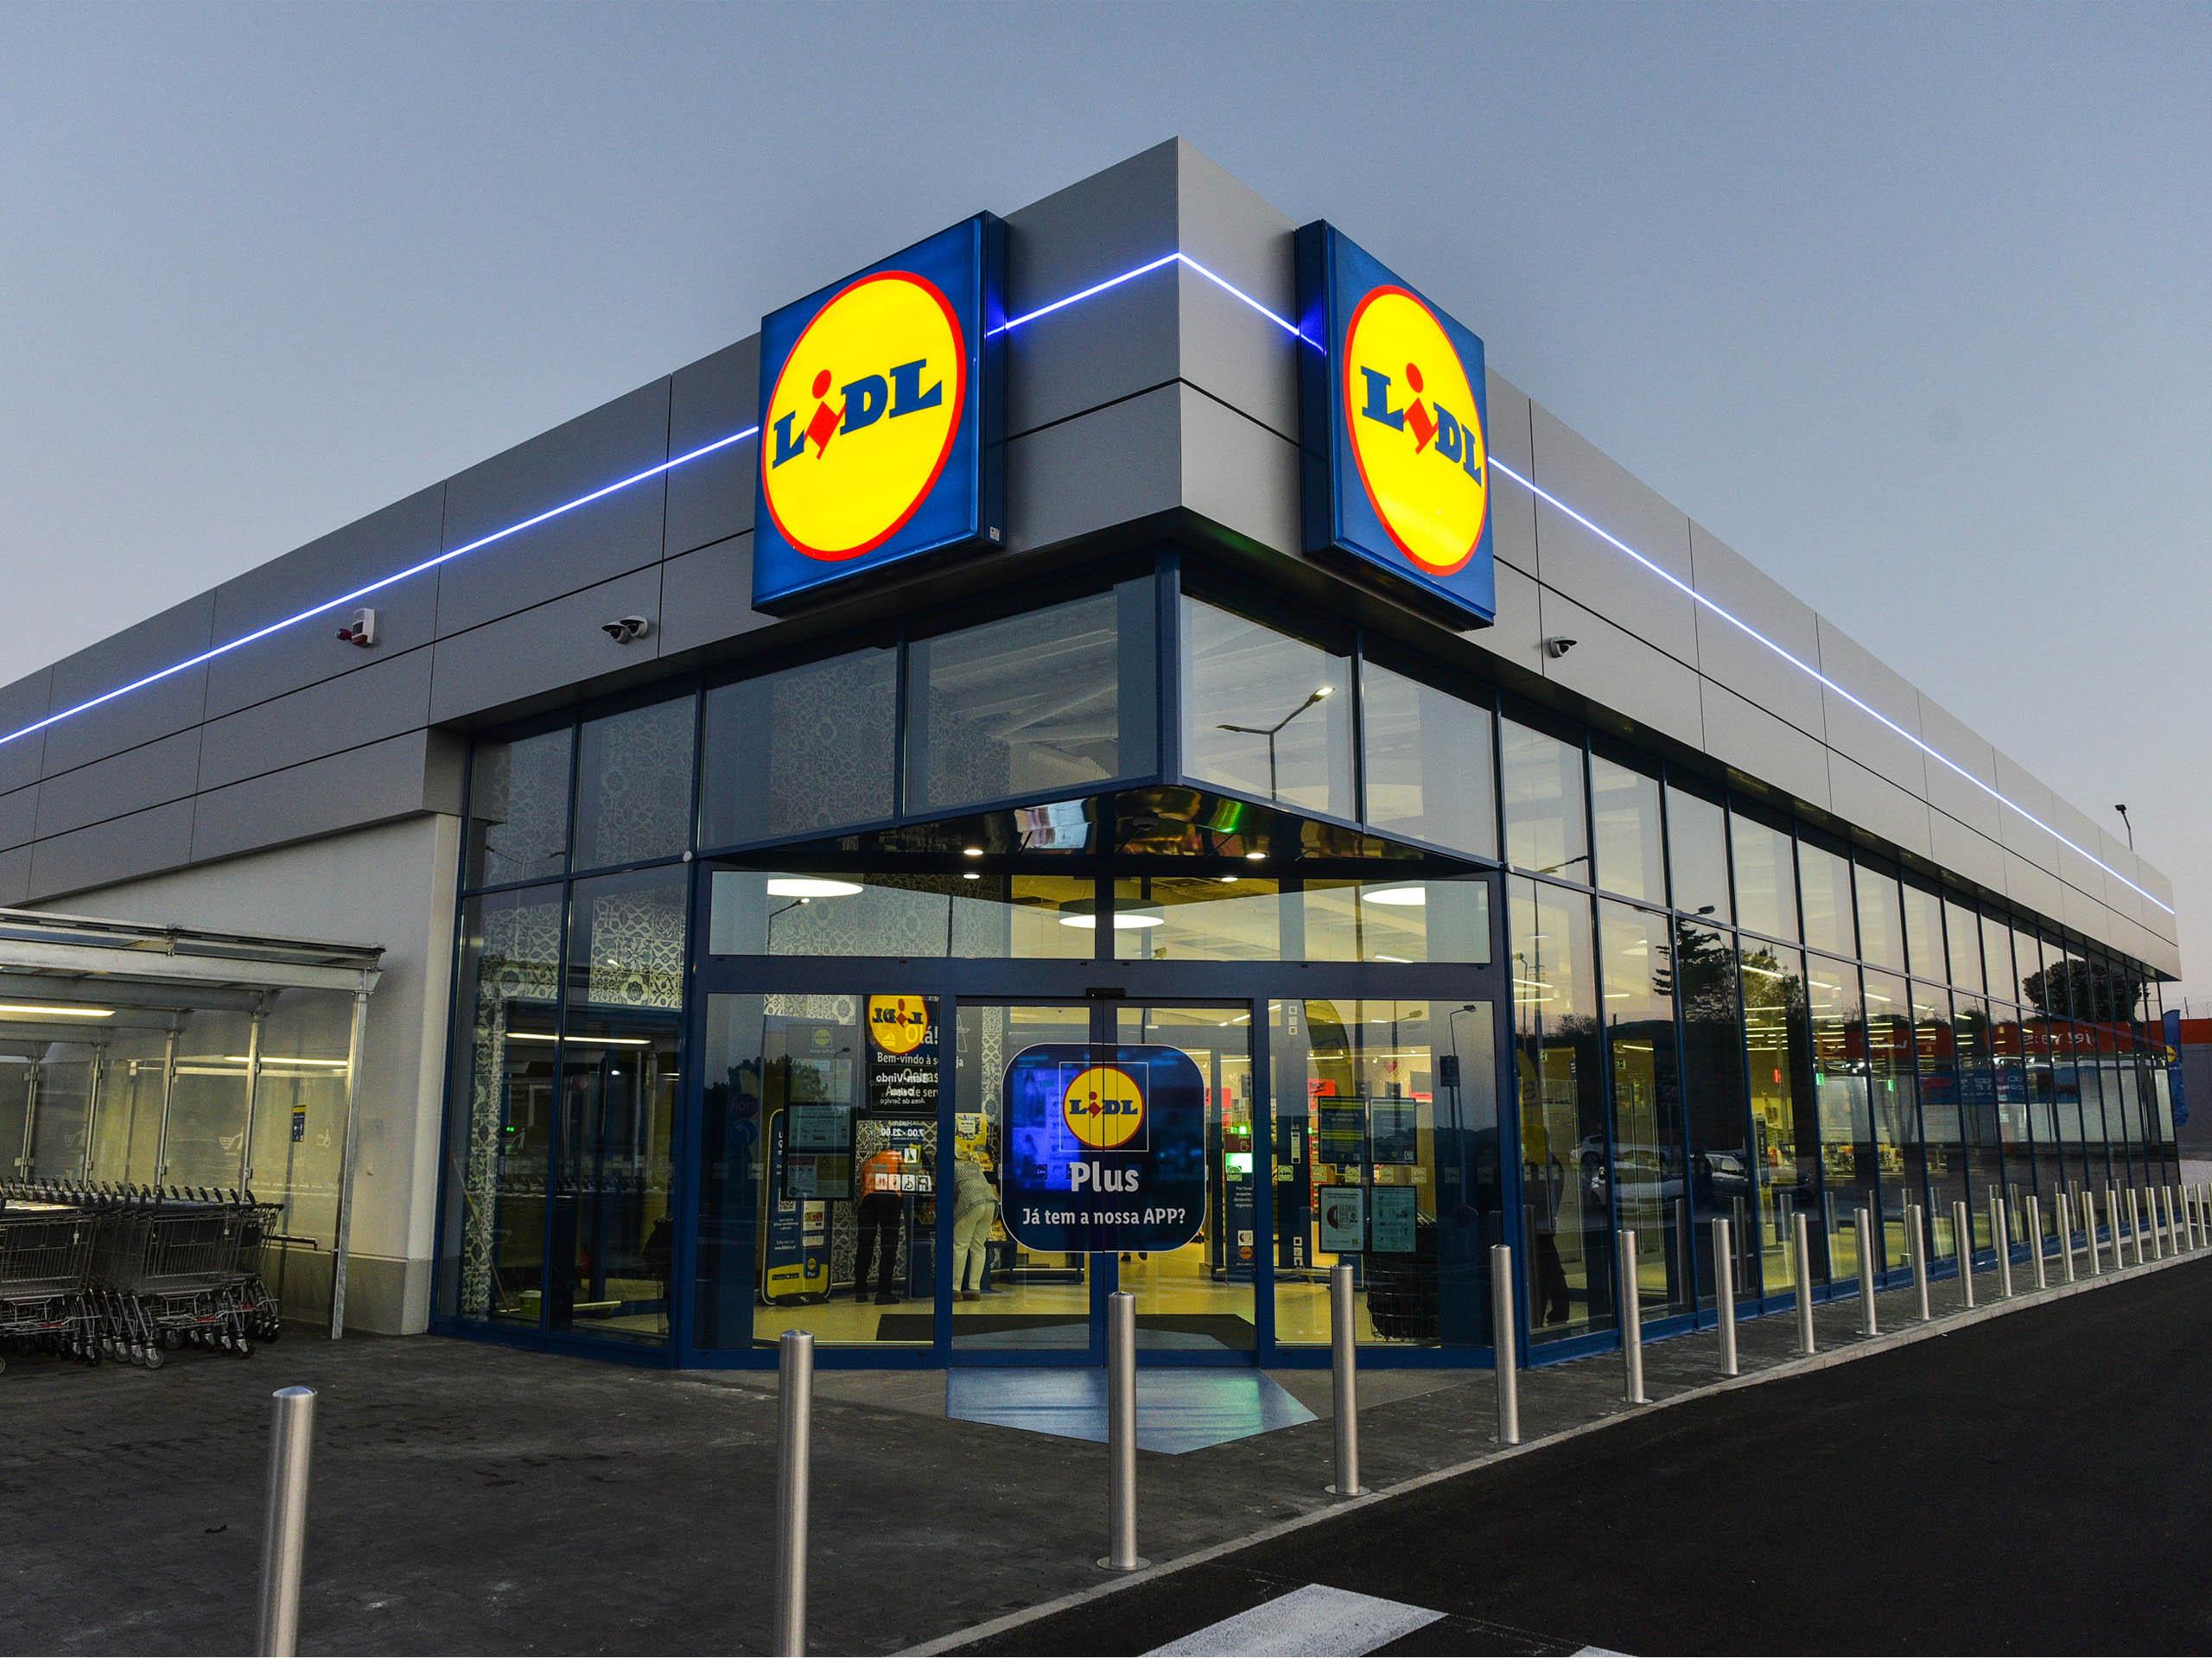 Nova loja Lidl em Oeiras